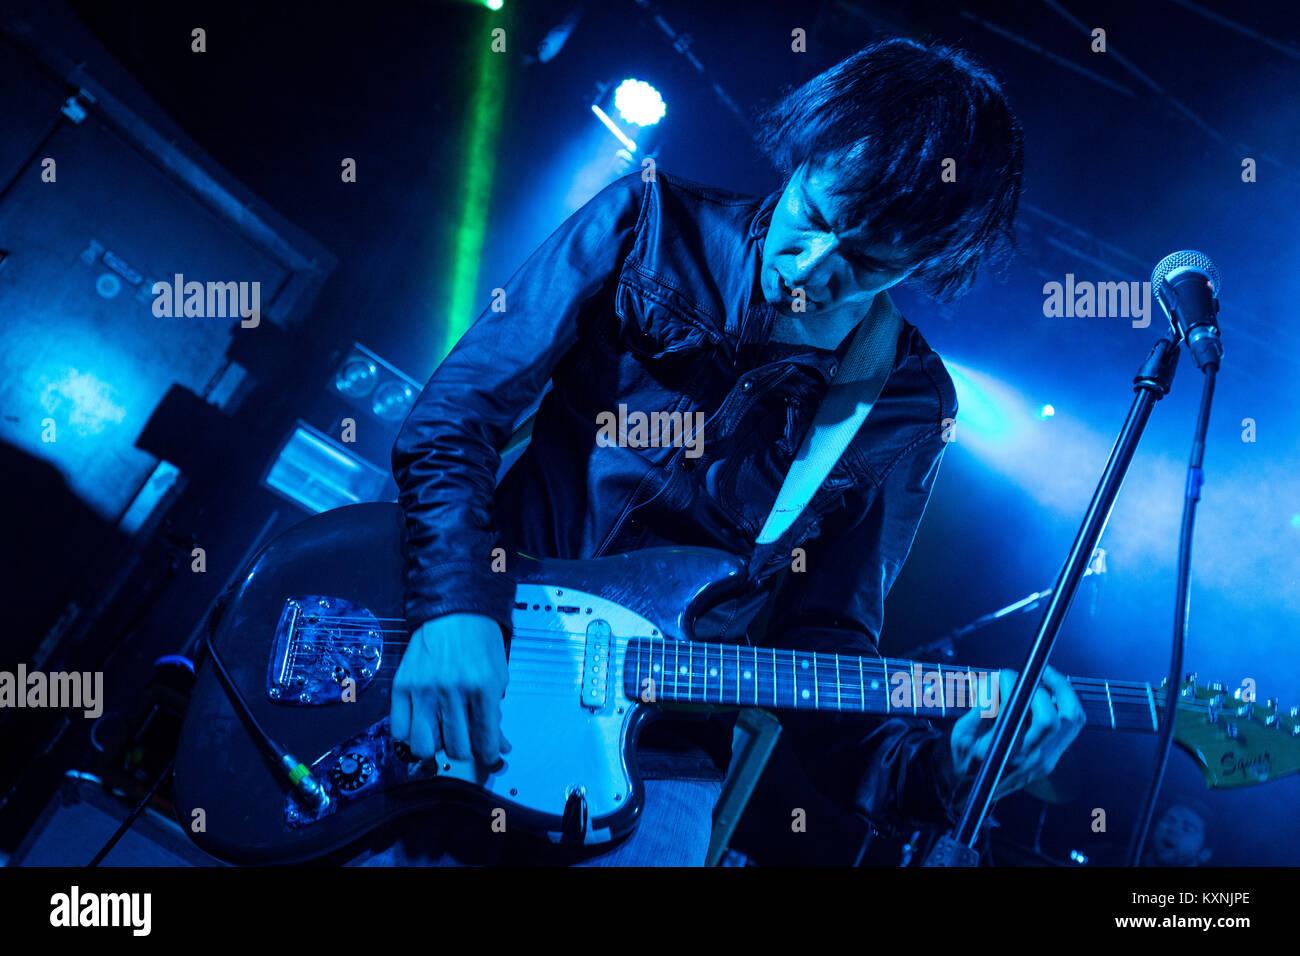 Cambridge, UK. 10th Jan, 2018. Vocalist Ryan Jarman of English indie rock band The Cribs peform live at the Cambridge Stock Photo